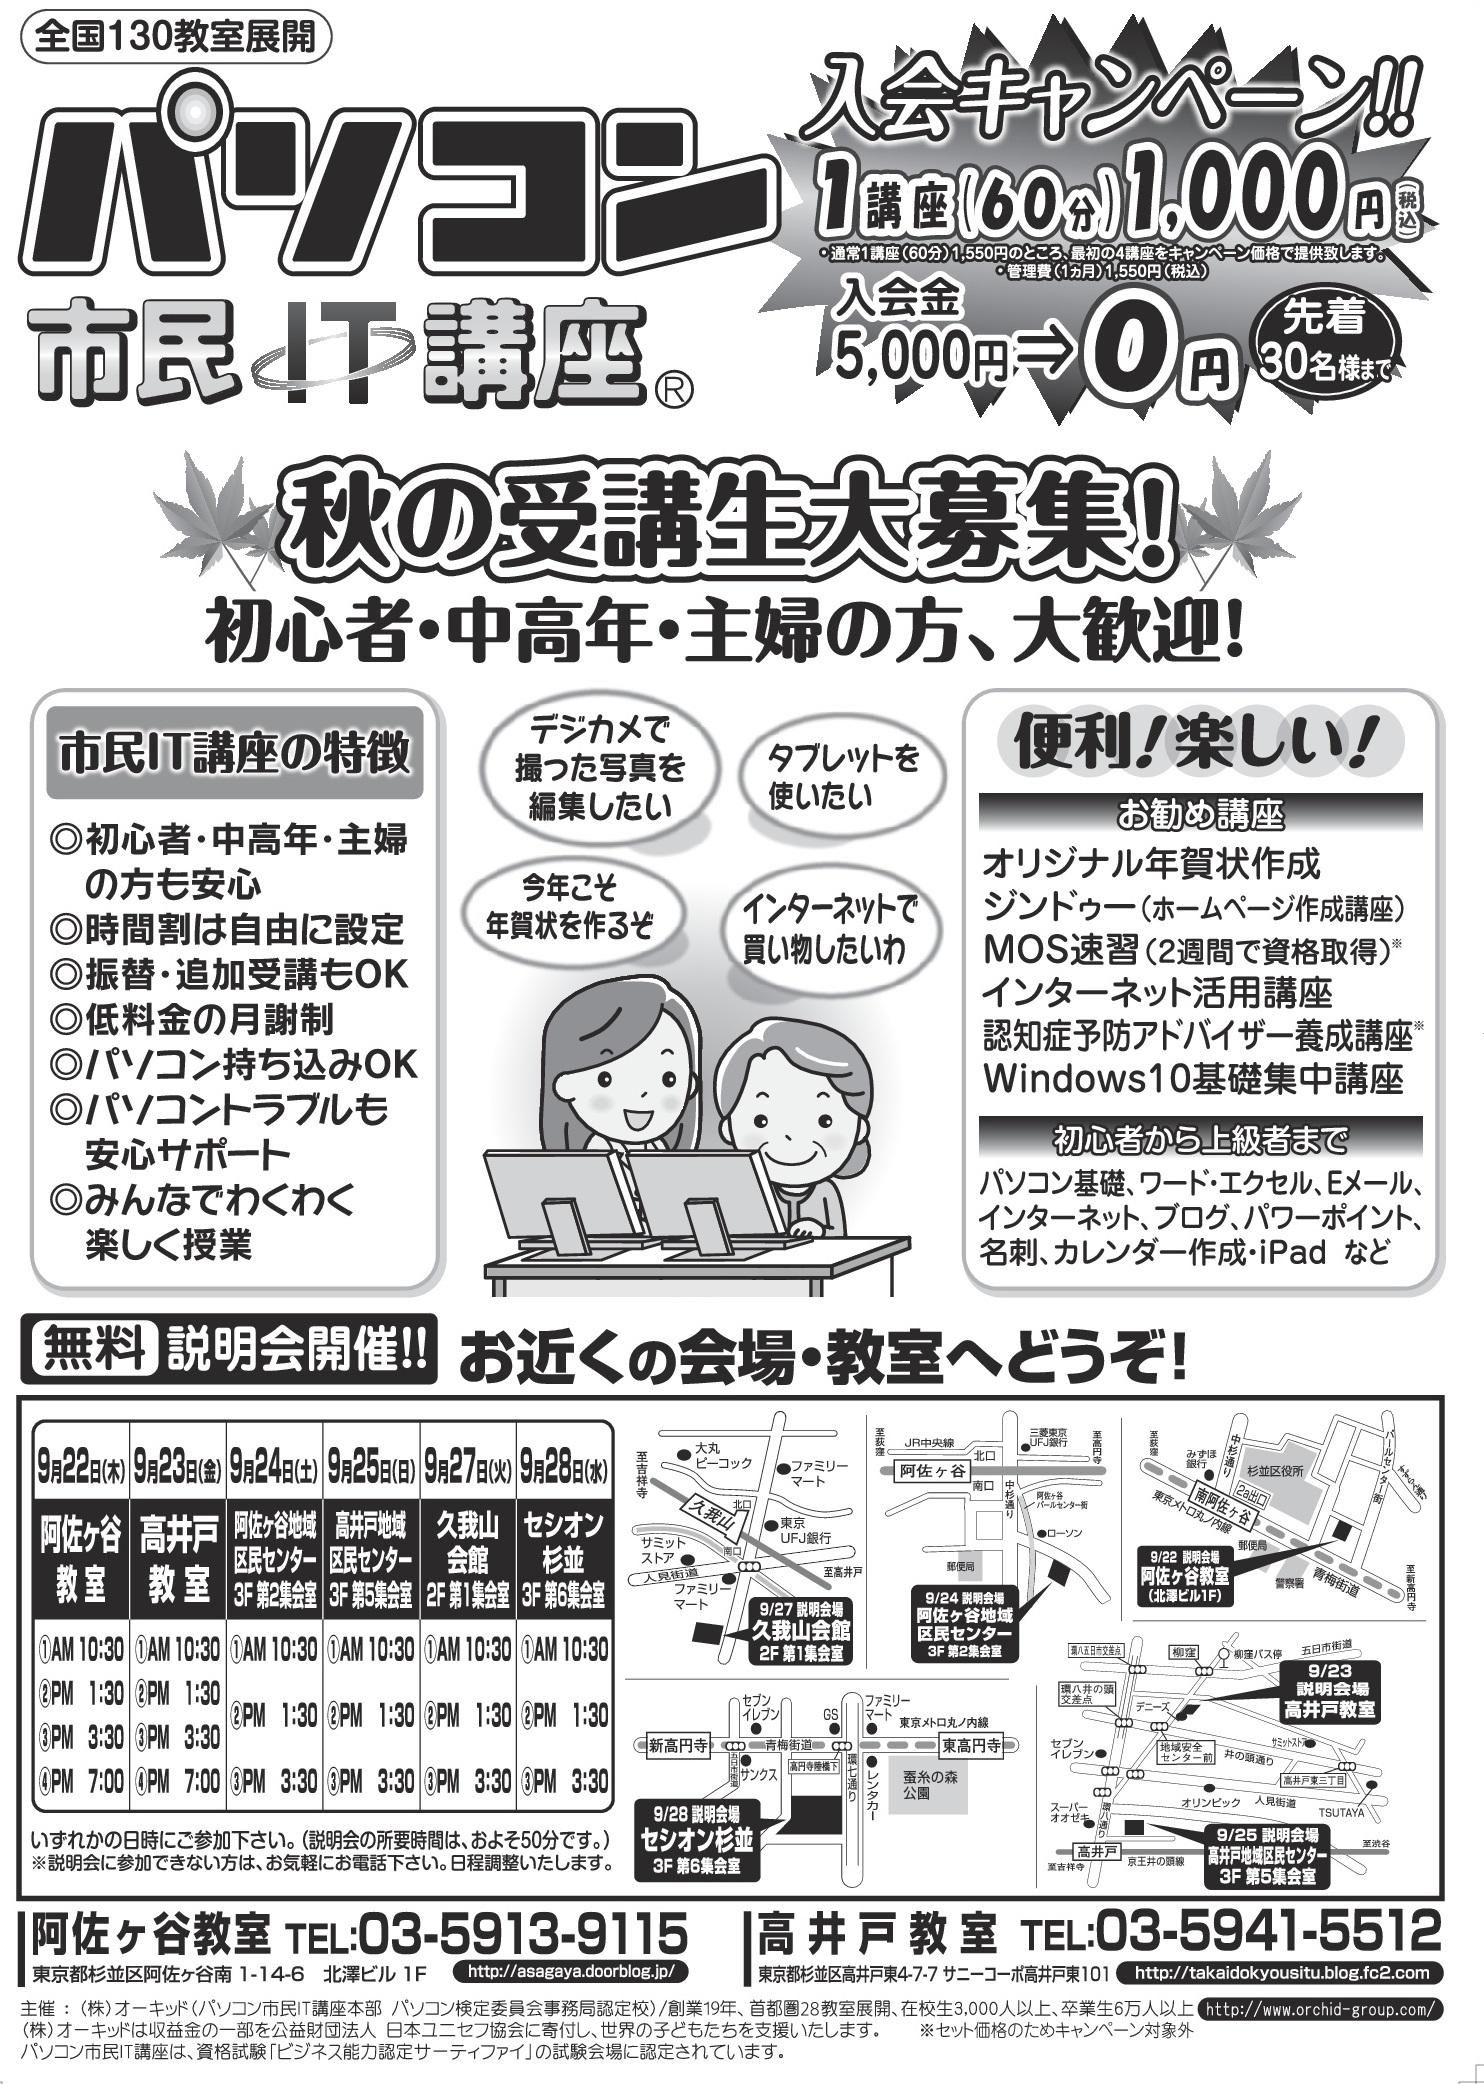 阿佐ヶ谷・高井戸教室-001